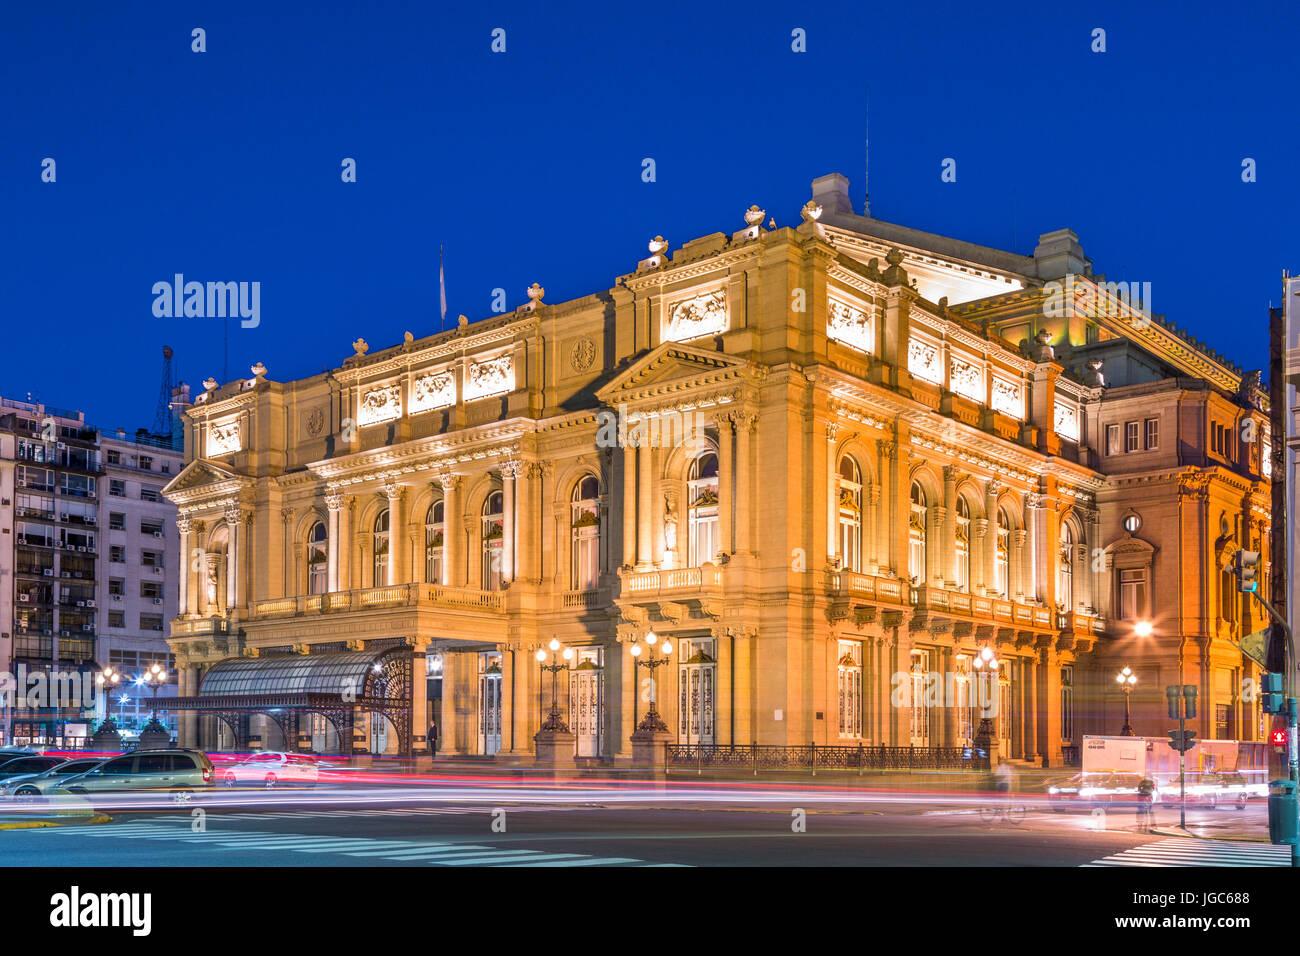 Teatro Colón, Buenos Aires, Argentina, South America - Stock Image